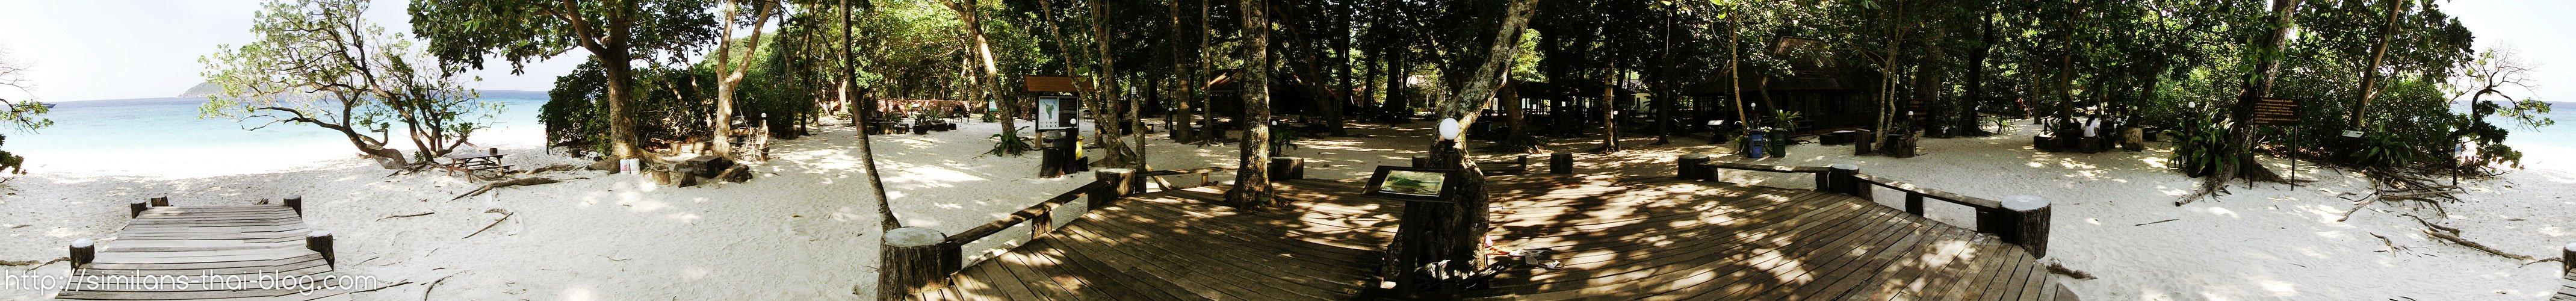 similan-no4-place-panorama